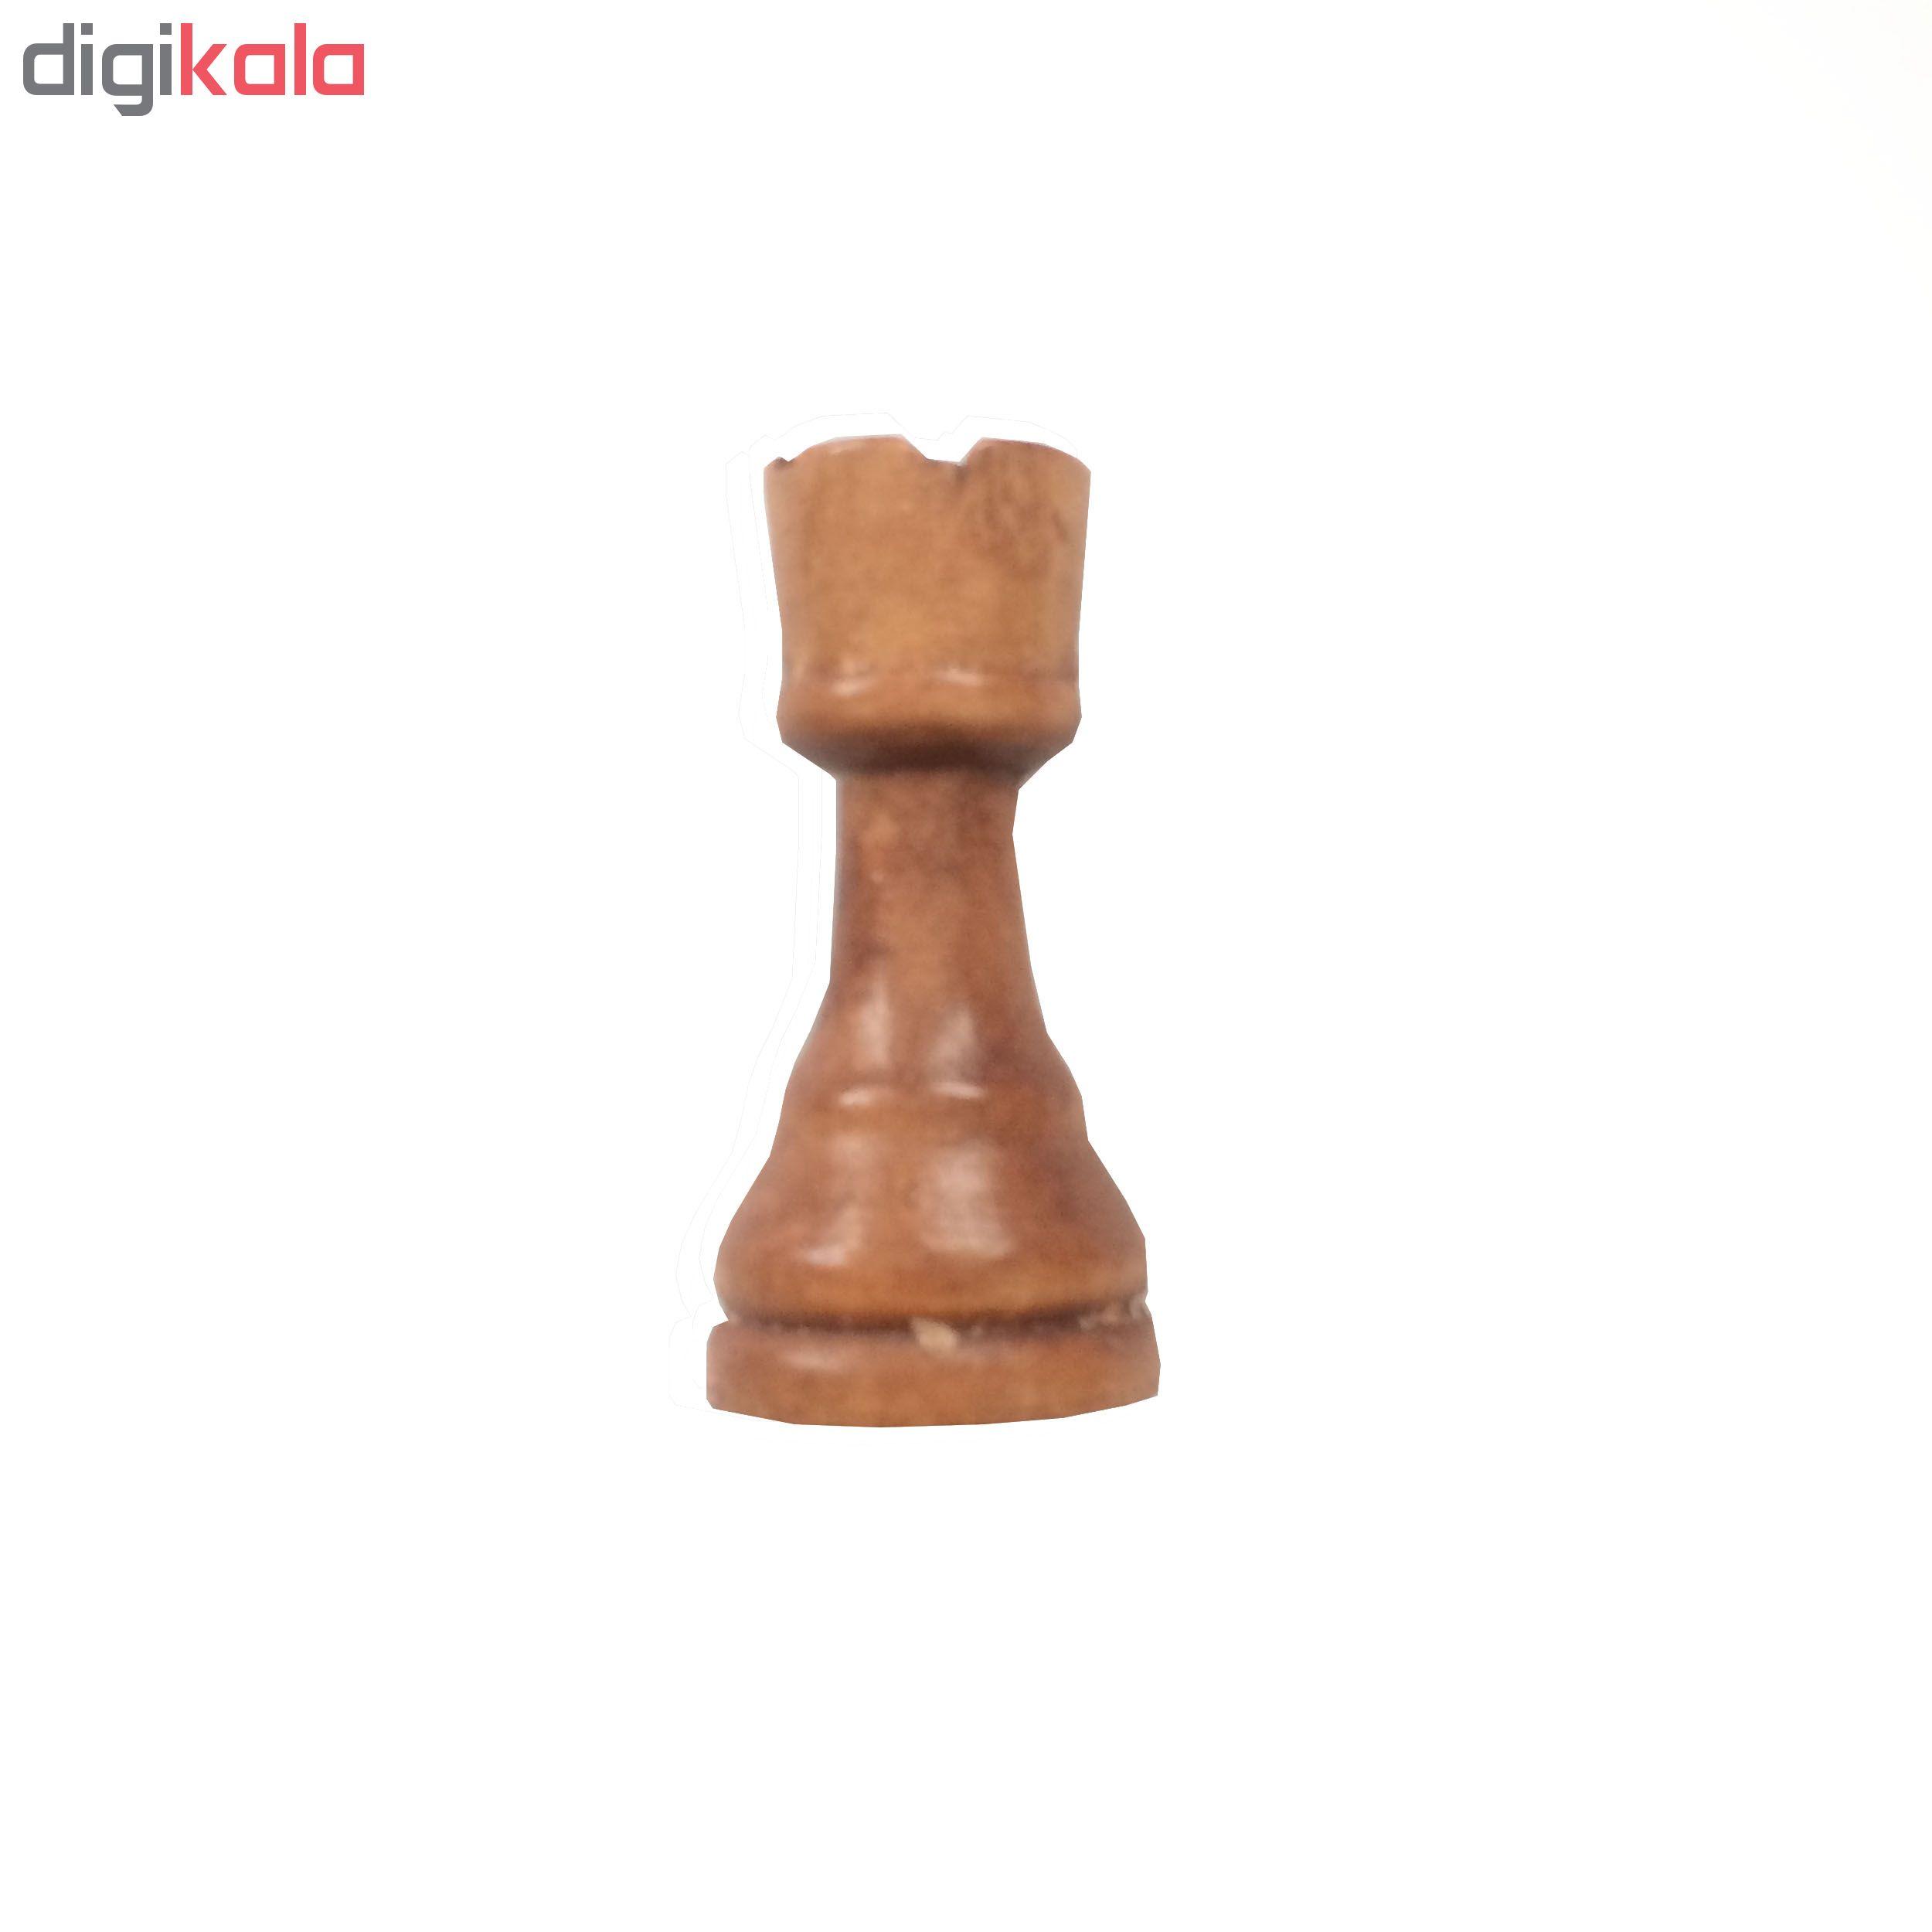 مهره شطرنج مدل G1 مجموعه 32 عددي